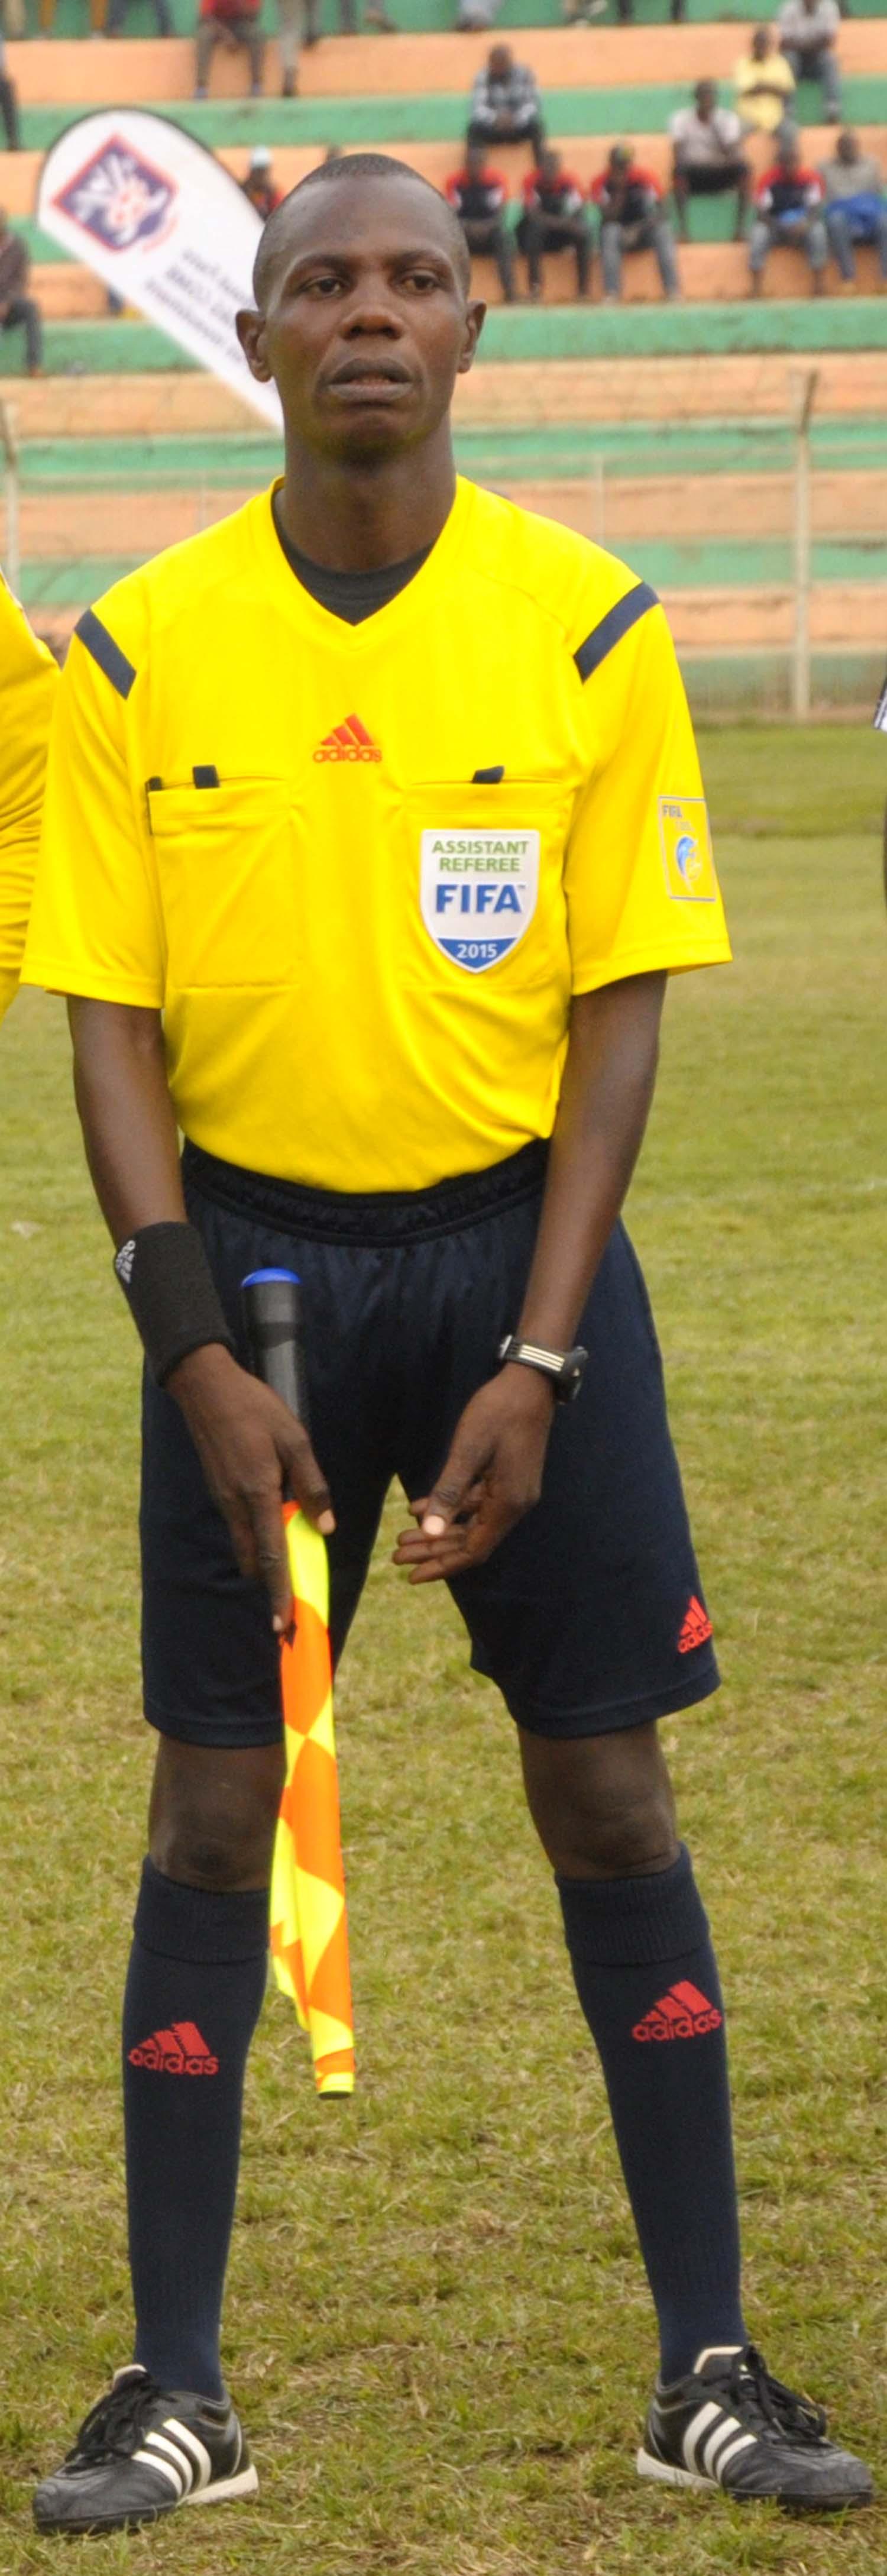 Mark Ssonko FIFA Assistant referee